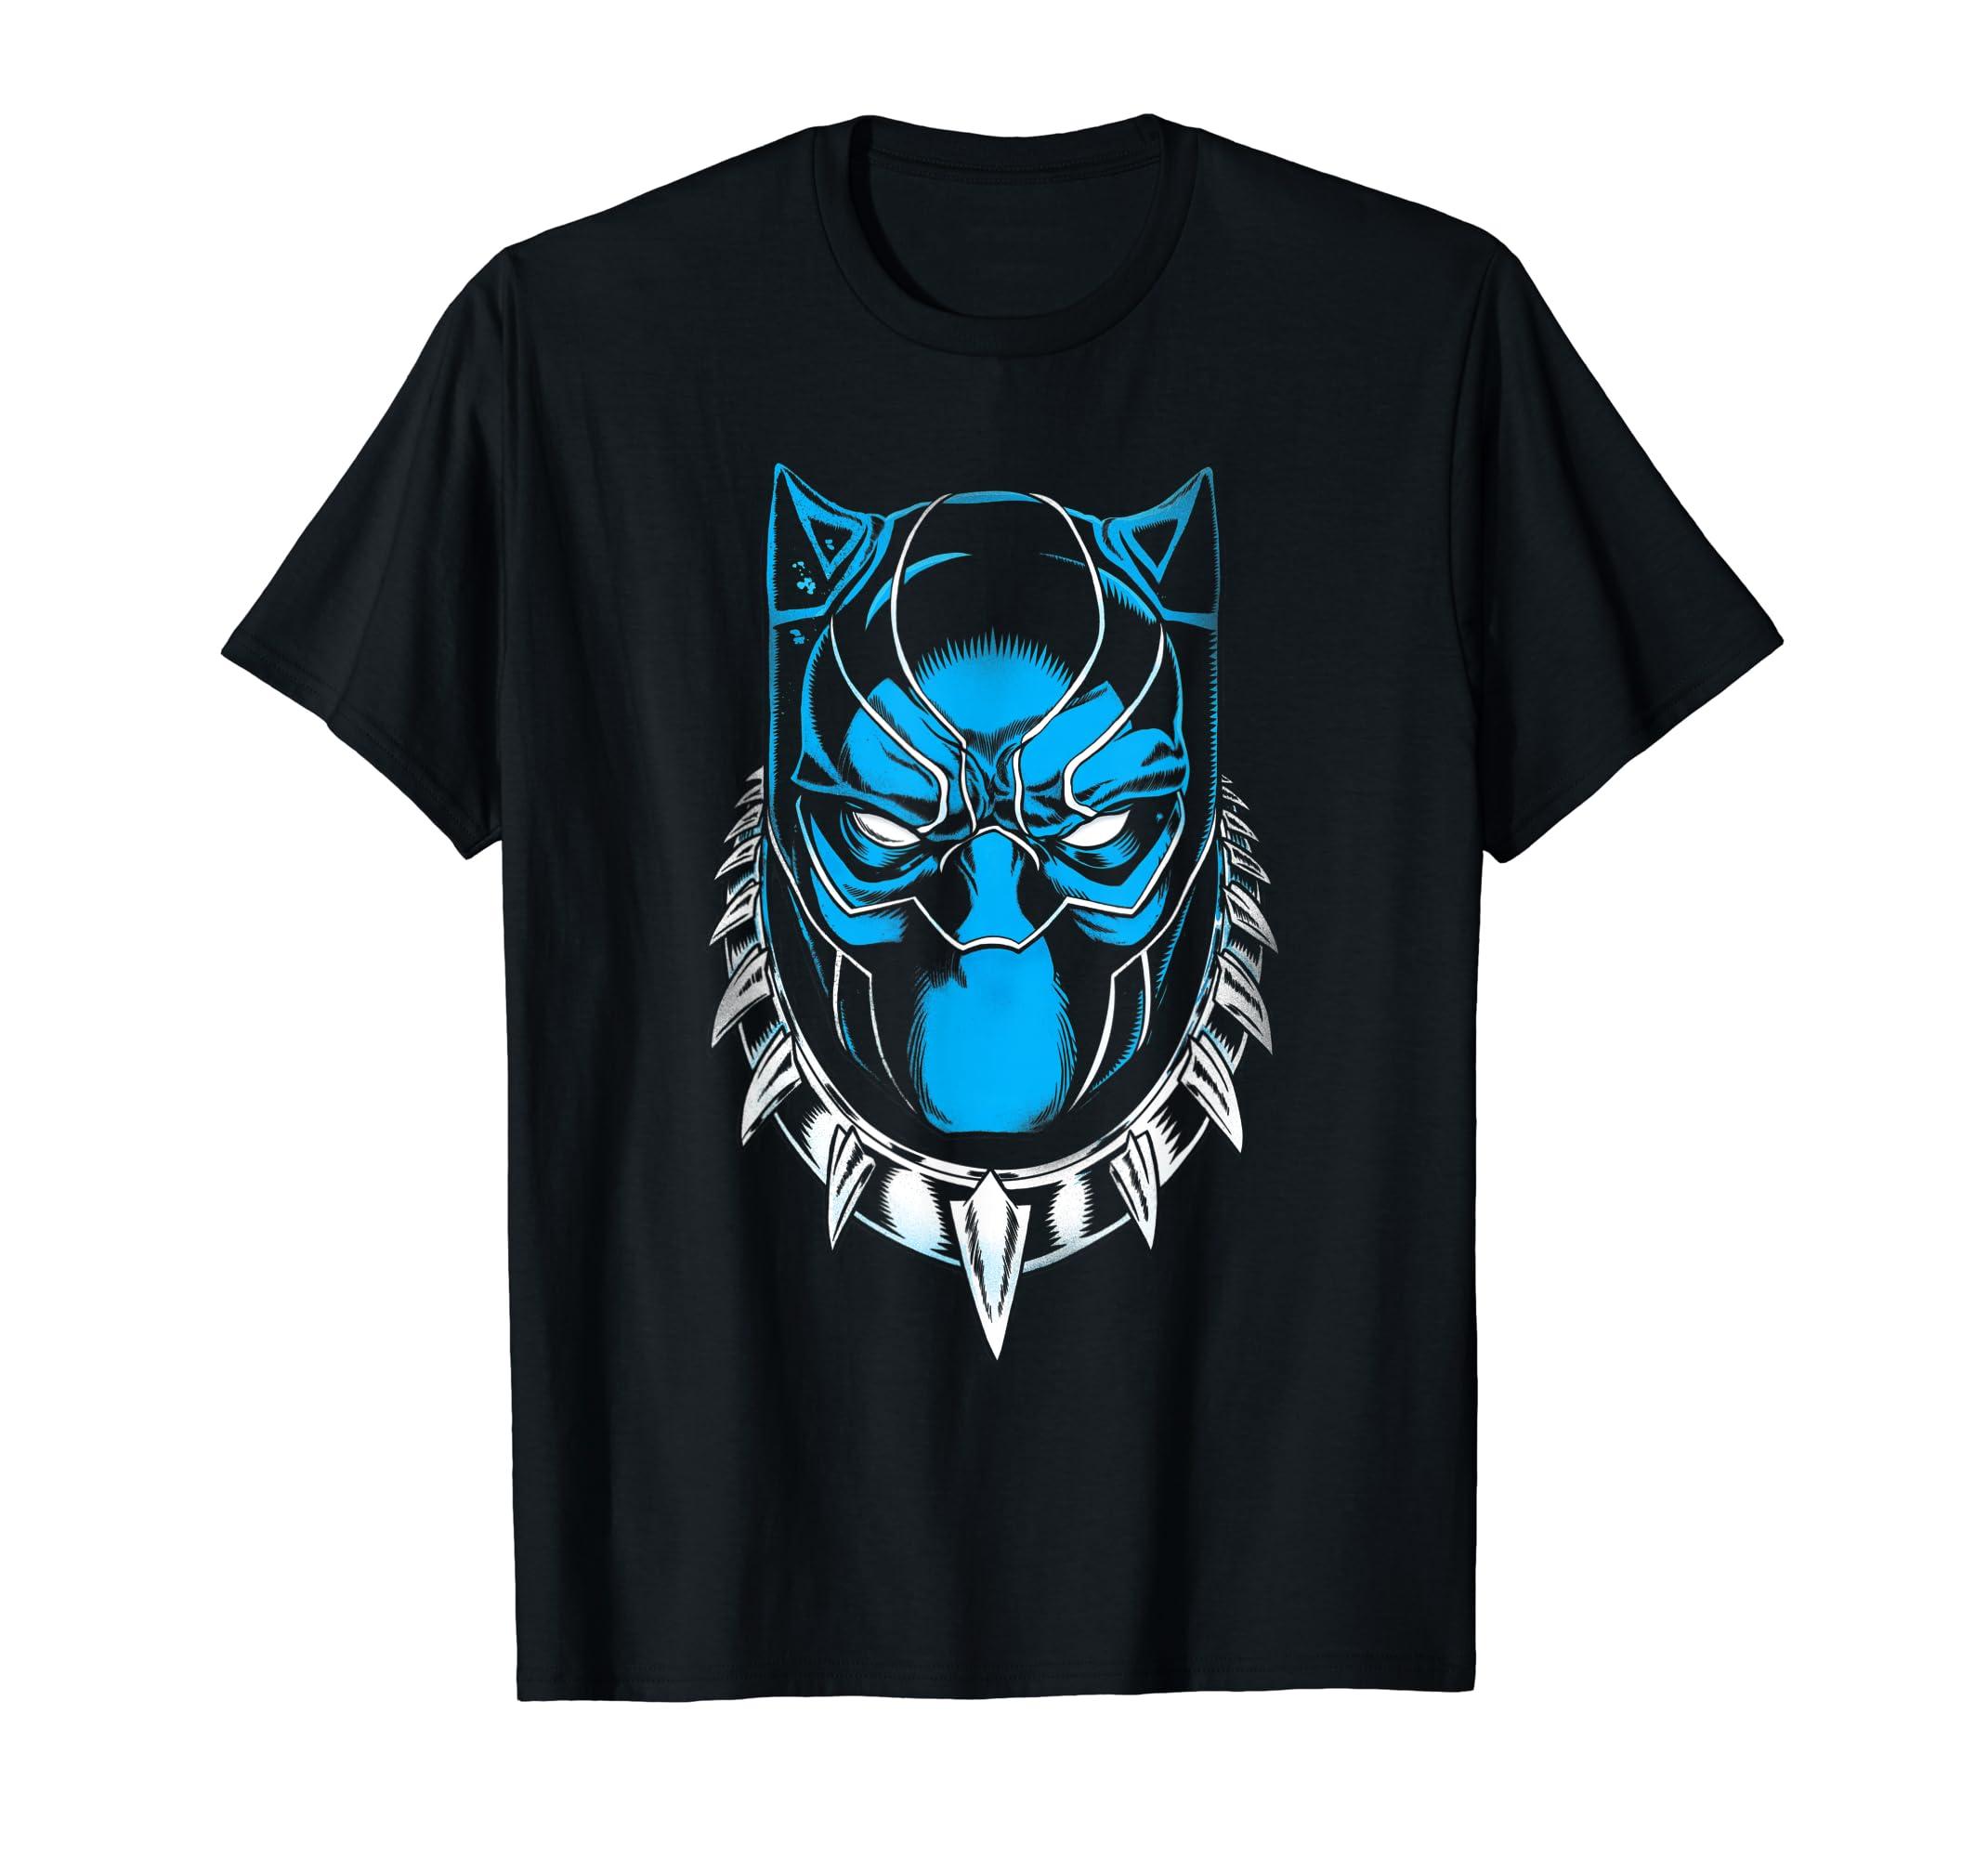 87ca1c12fd4f Amazon.com: Marvel Black Panther King T'Challa Mask T-Shirt: Clothing